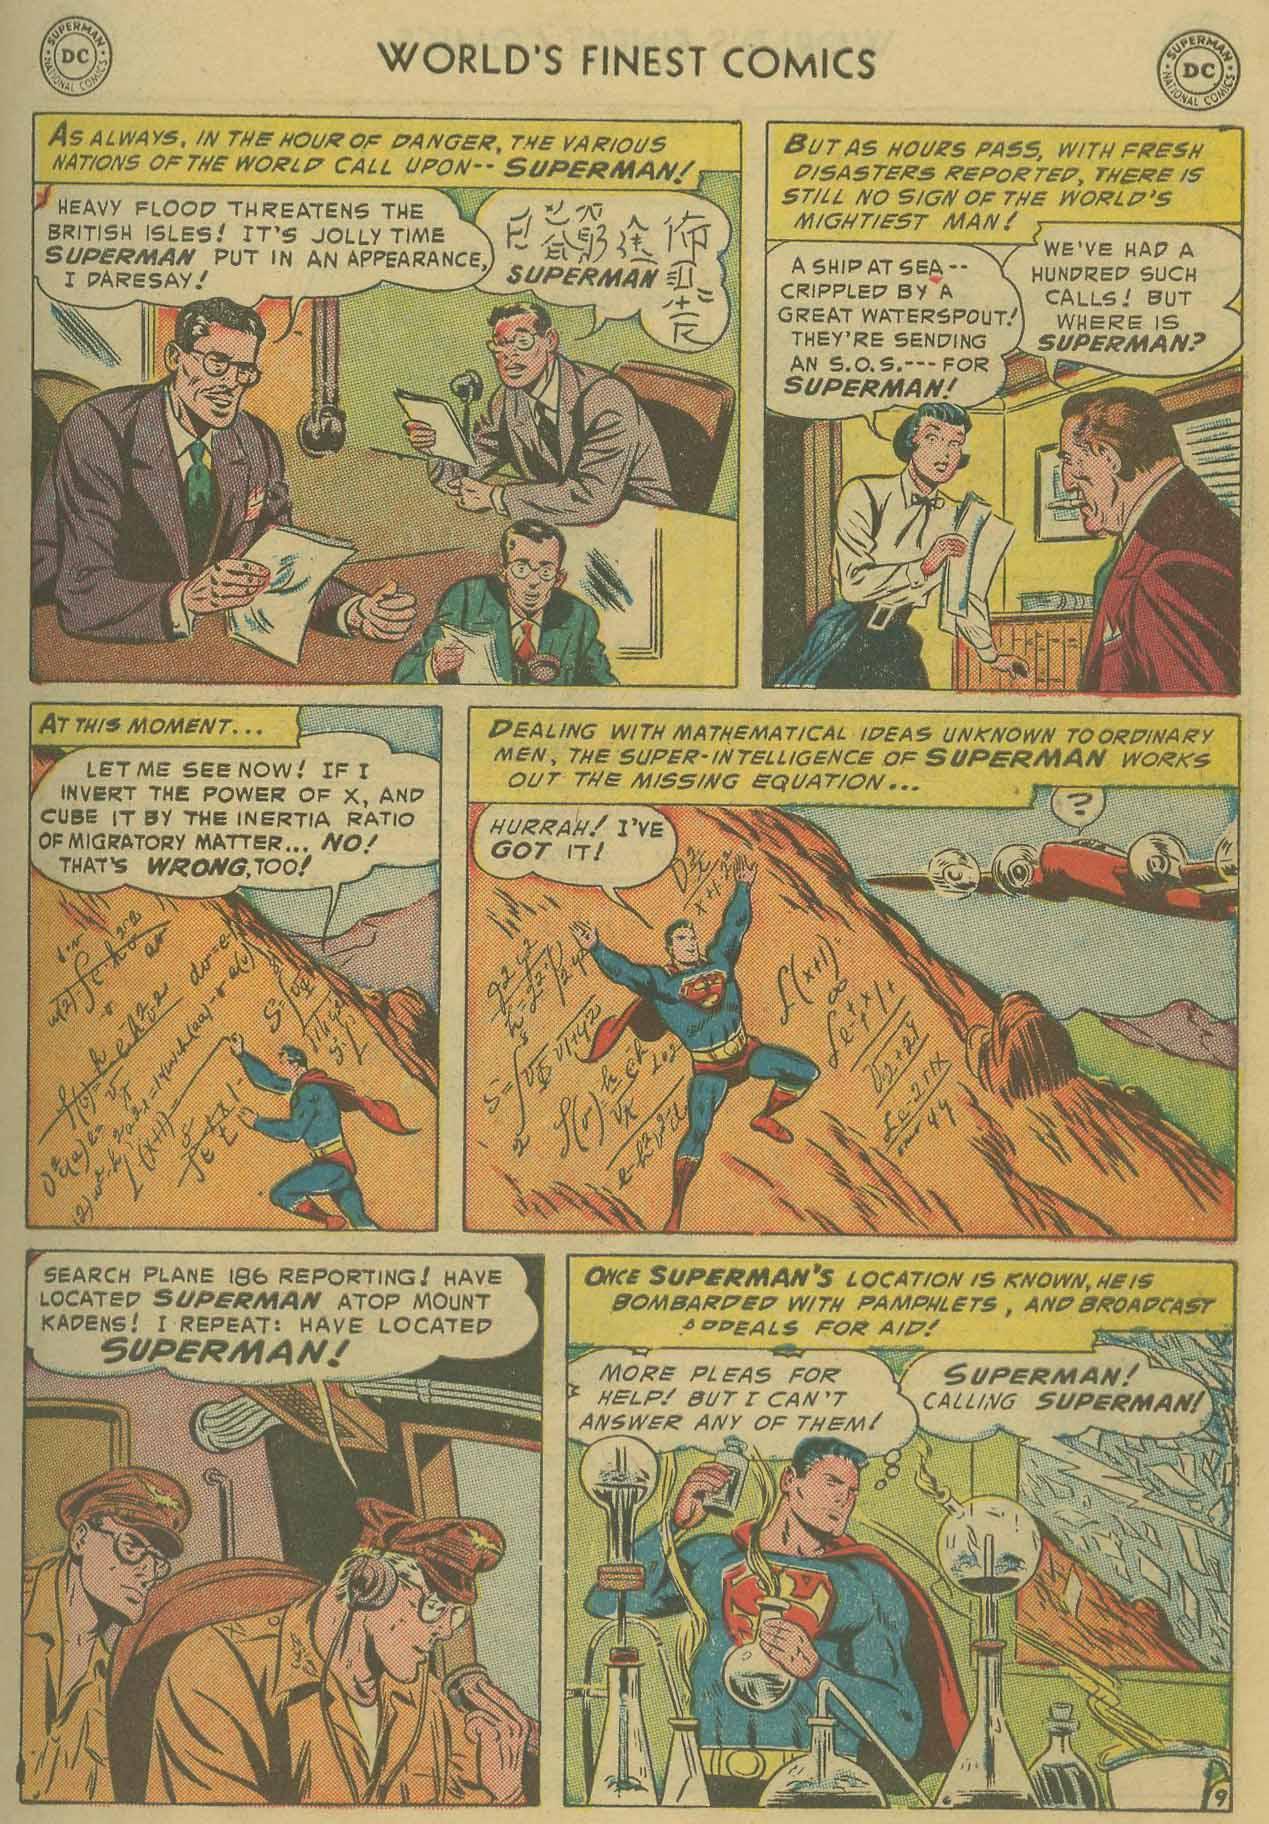 Read online World's Finest Comics comic -  Issue #69 - 11